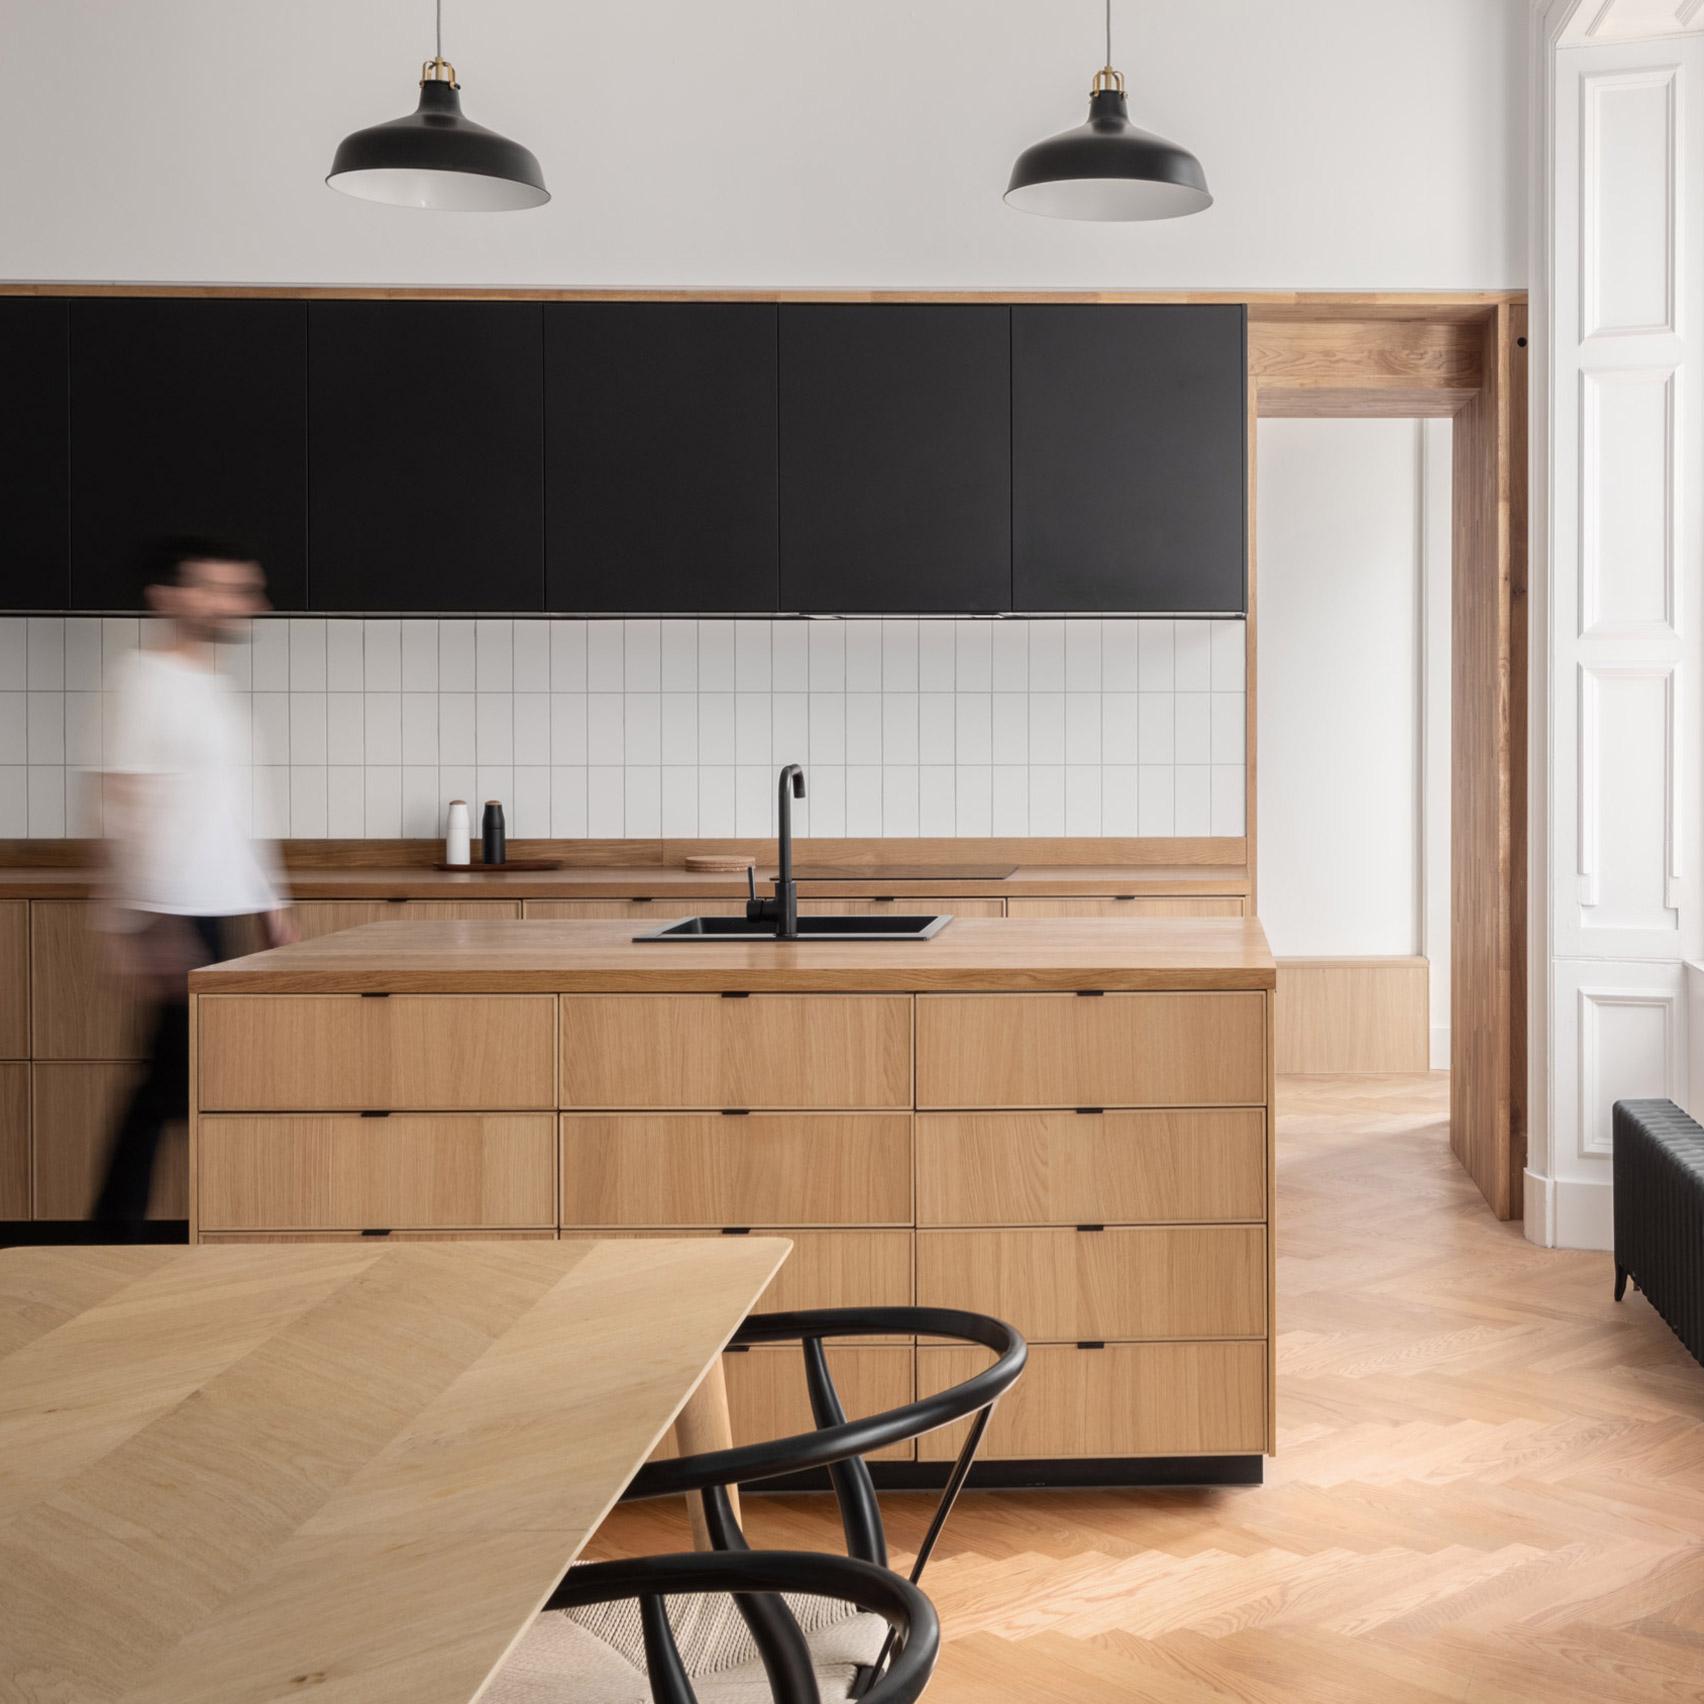 Dezeen's top home interiors of 2020: Edinburgh apartment by Luke and Joanne McClelland